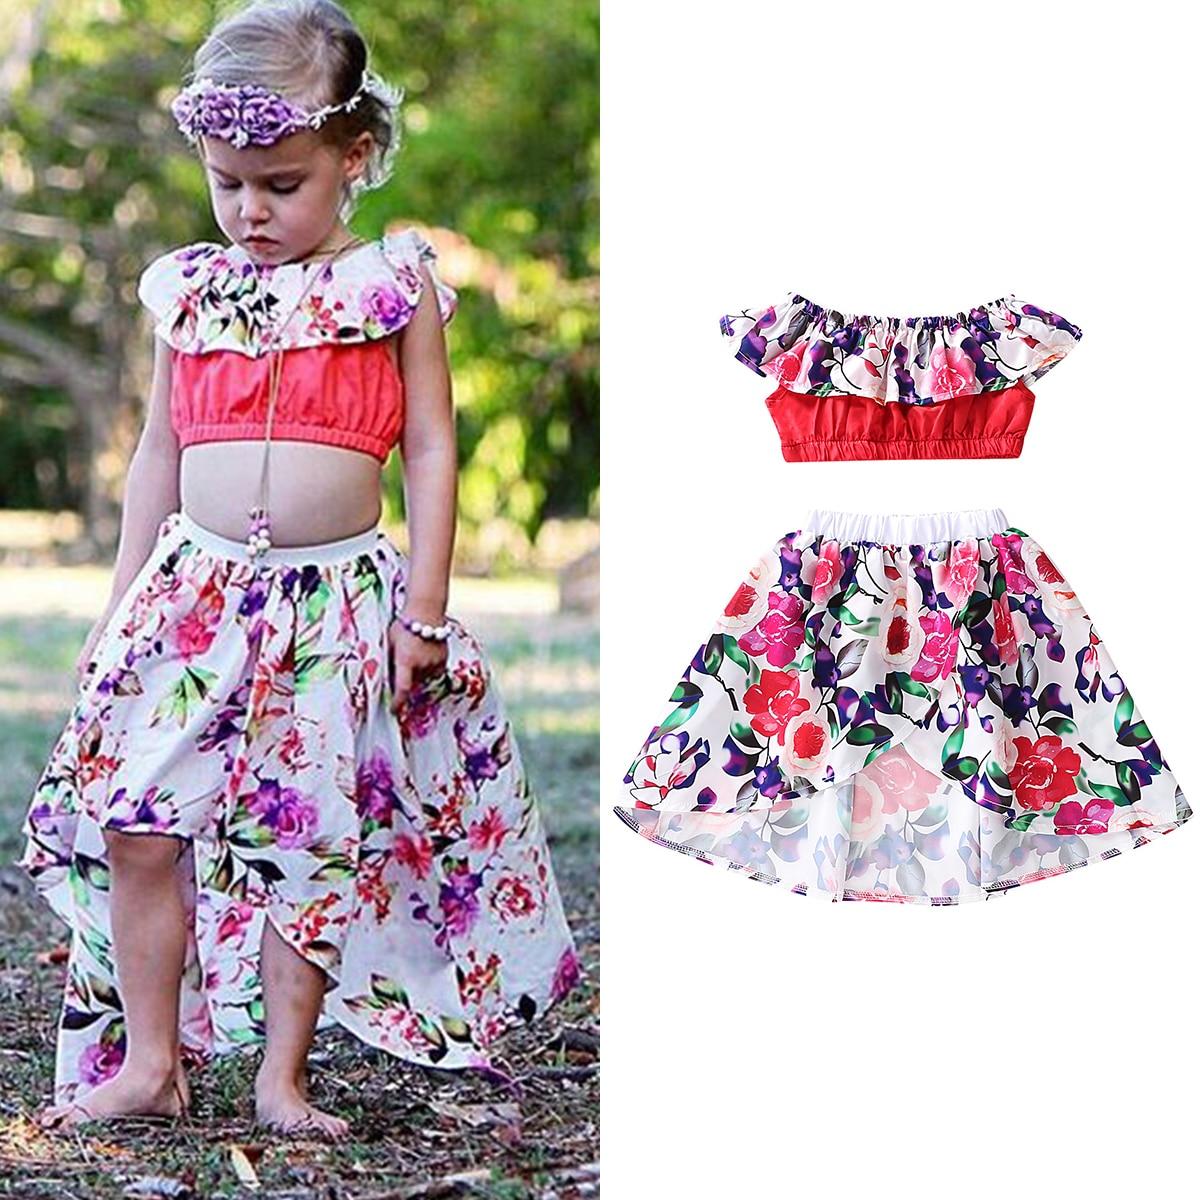 Kids Girl 2PCS Boutique Flower Off Shoulder Top Dress Skirt Pants Clothes Outfit